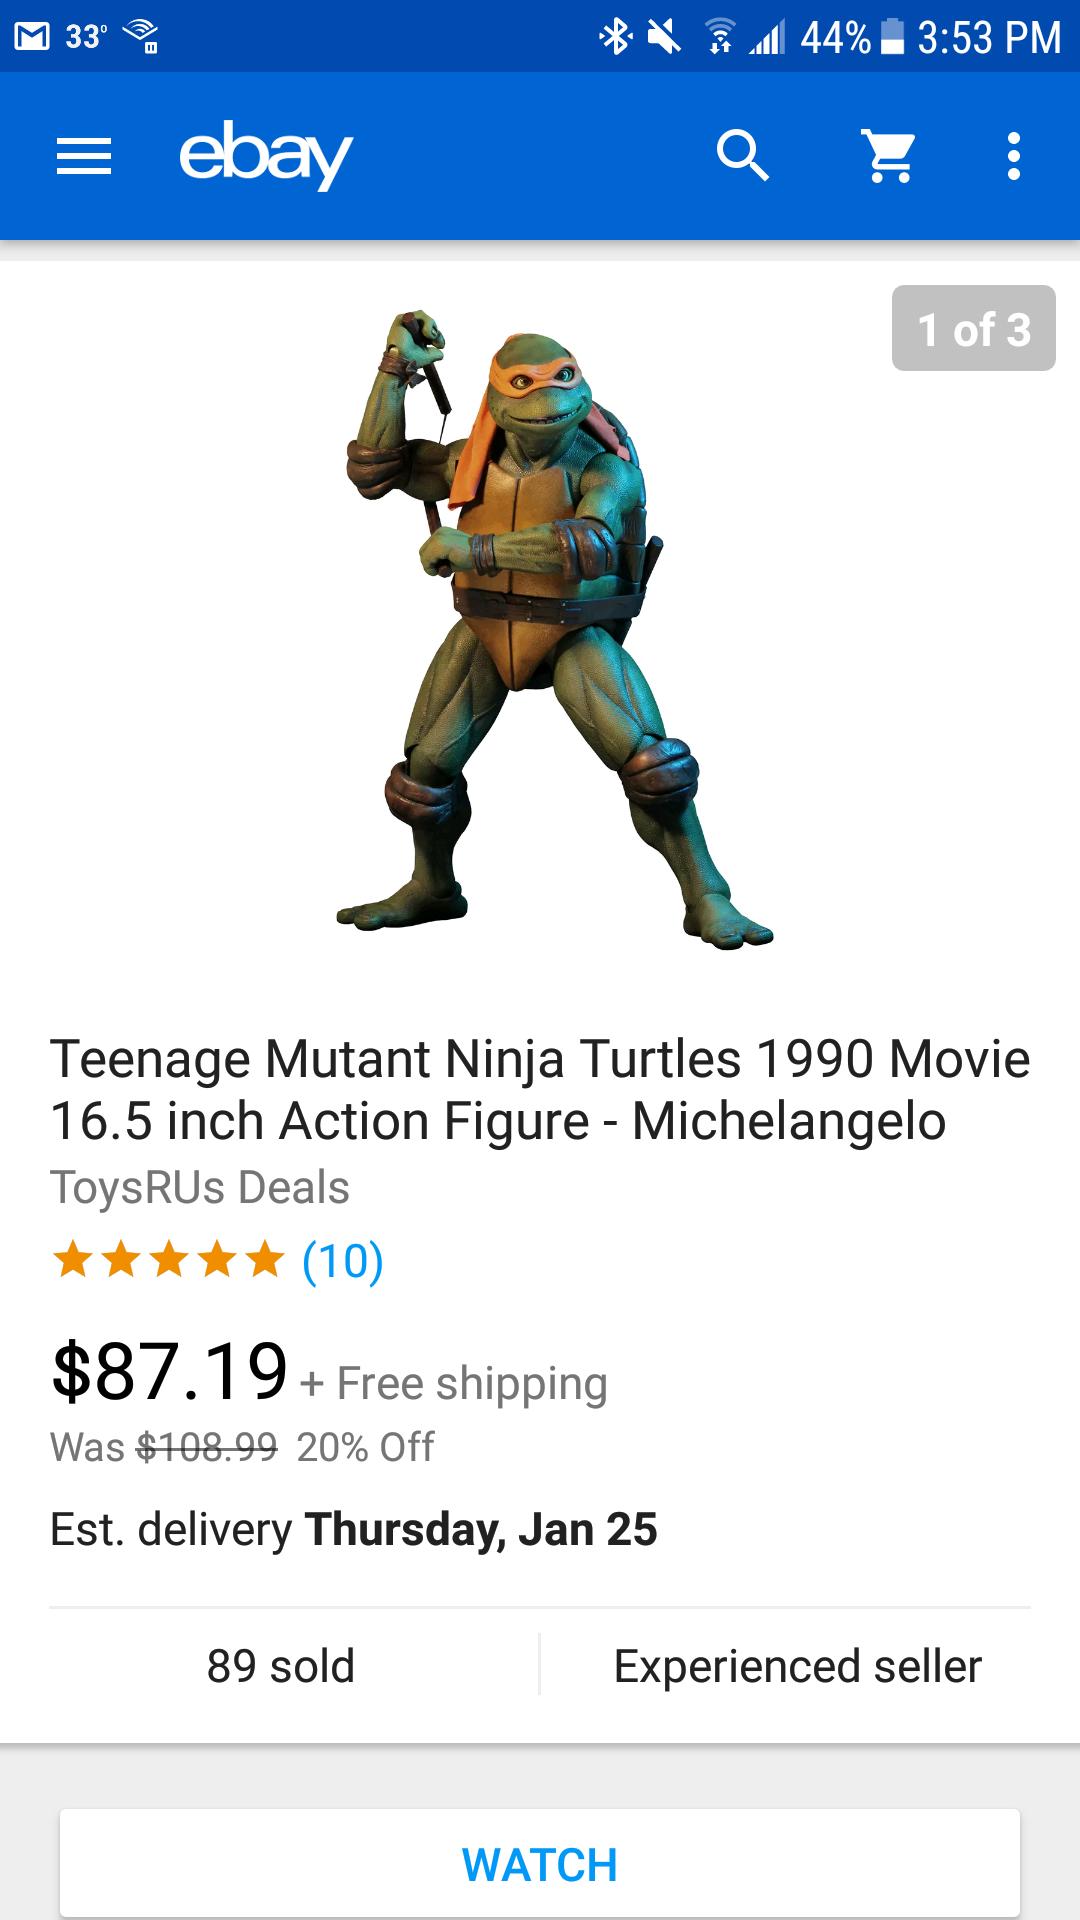 NECA TMNT Michelangelo 1/4 Scale Figure for $87.19